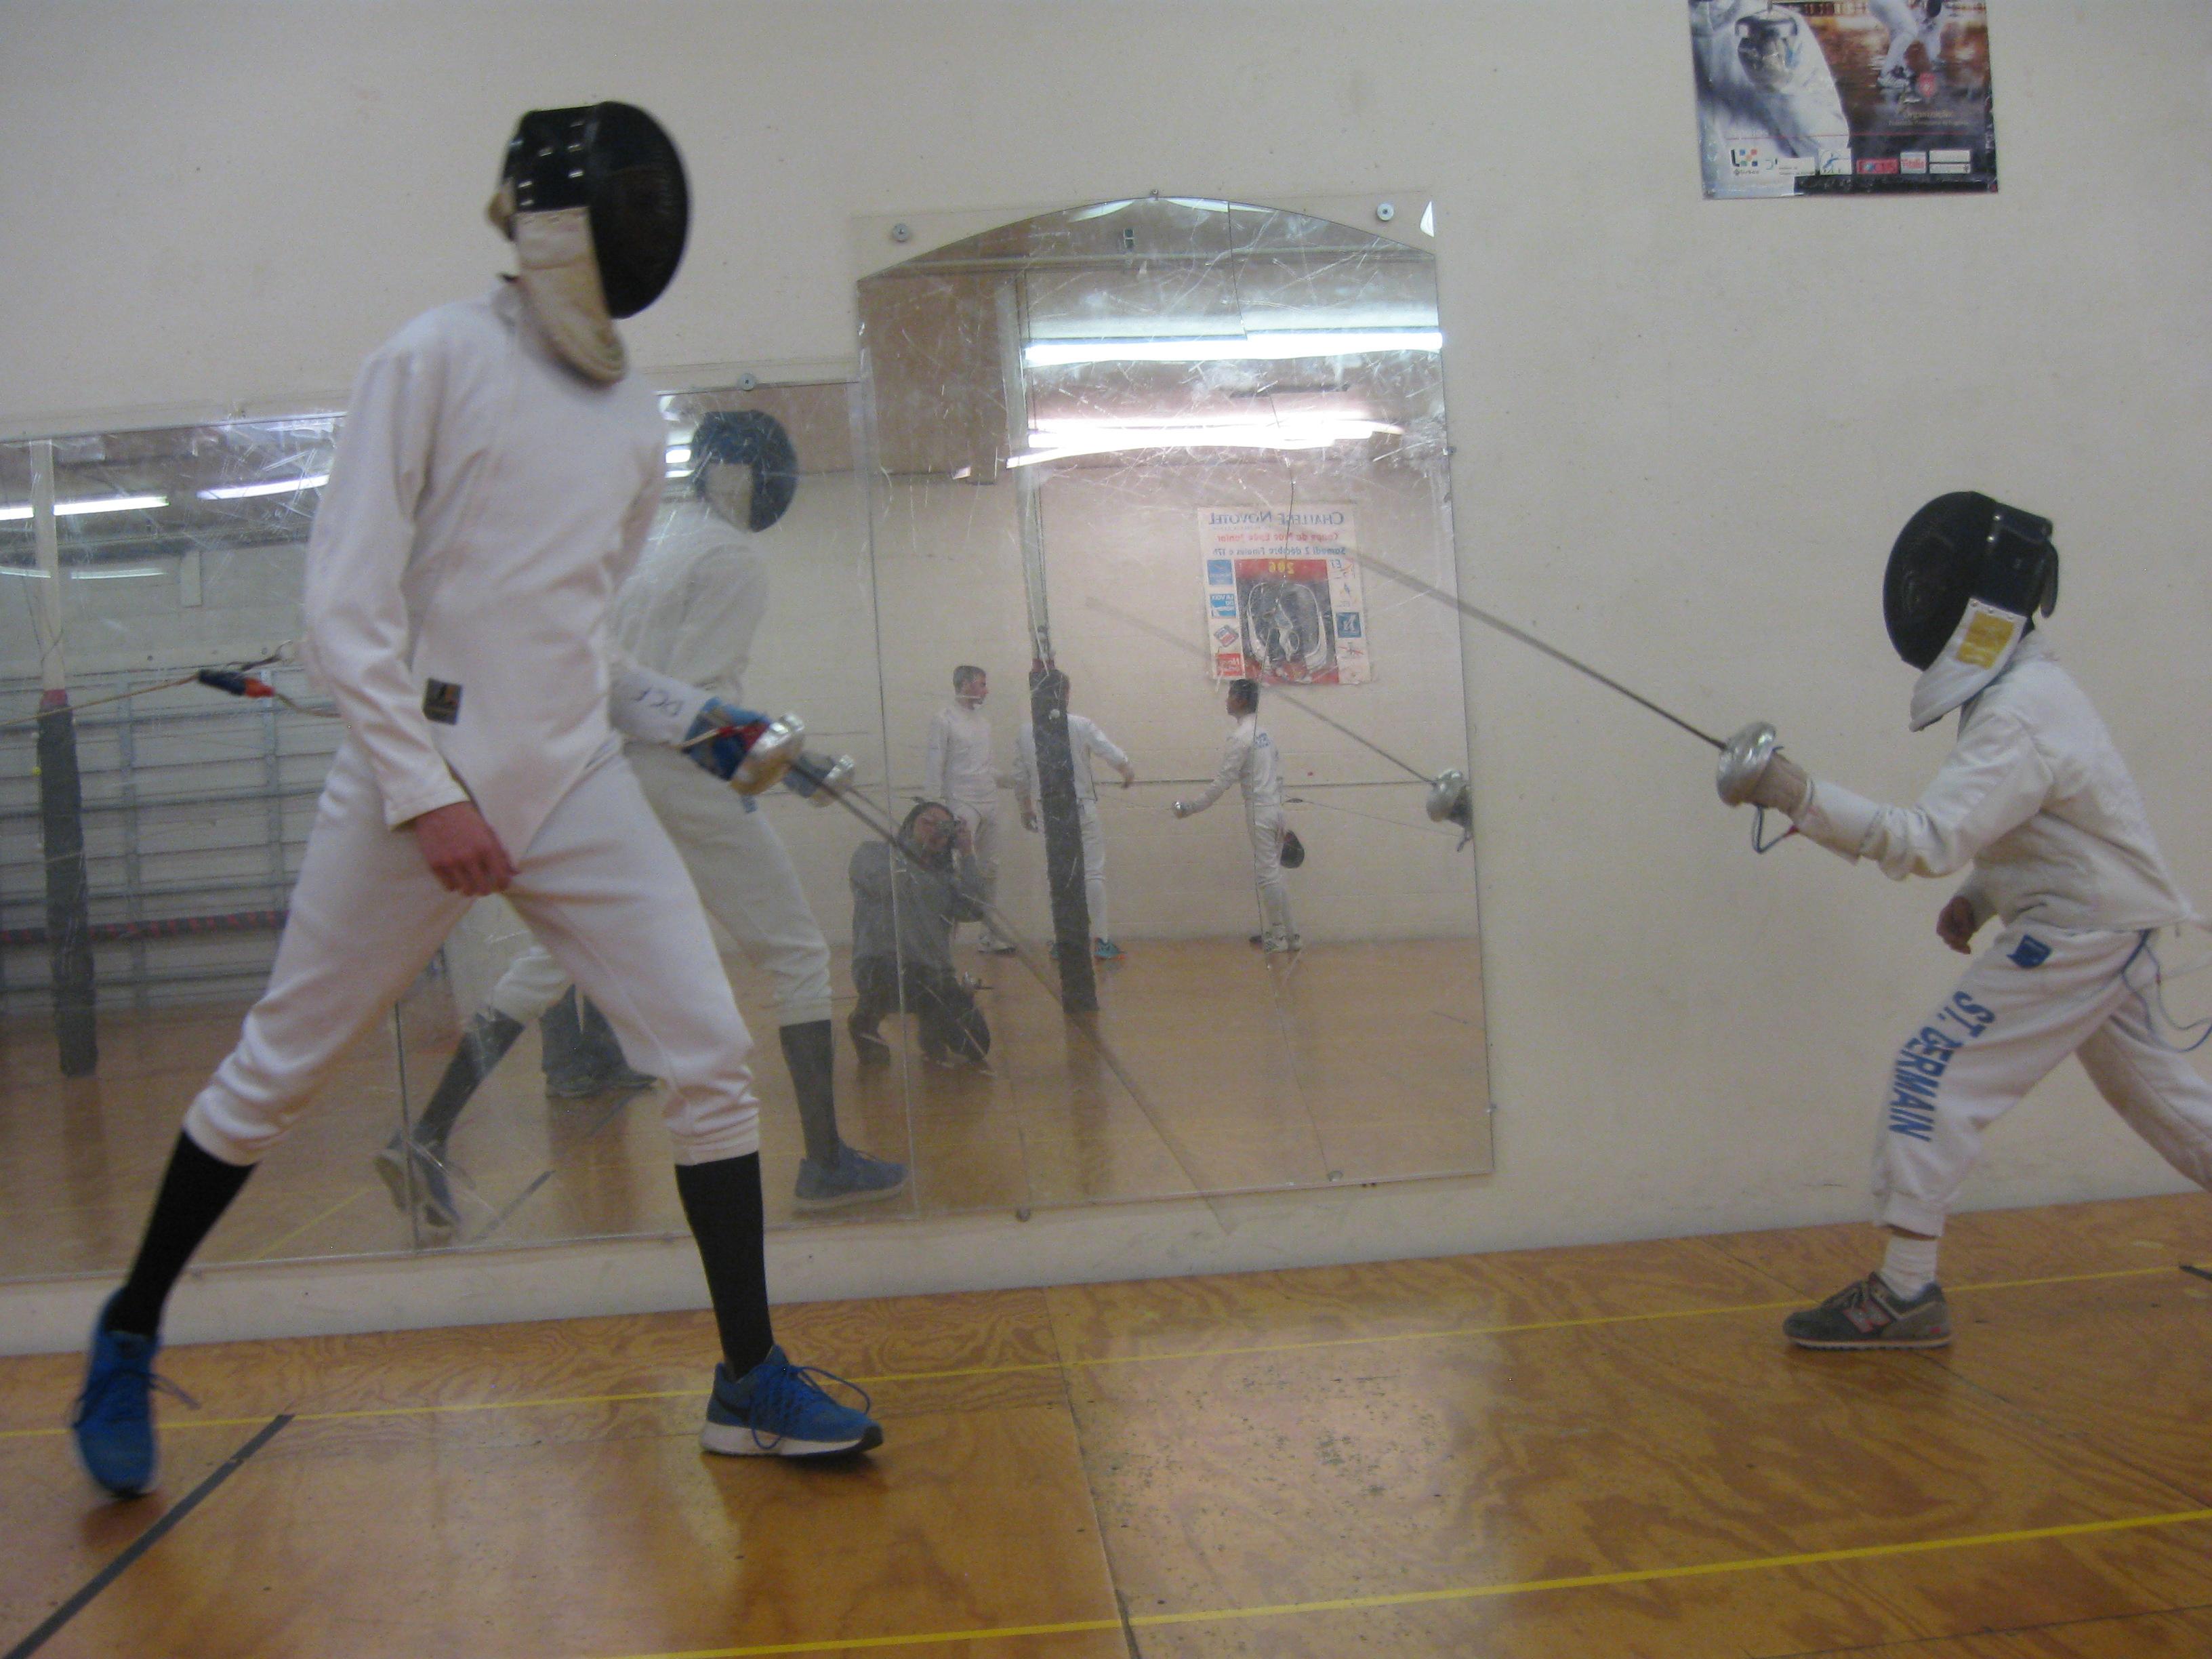 Duke City Fencing